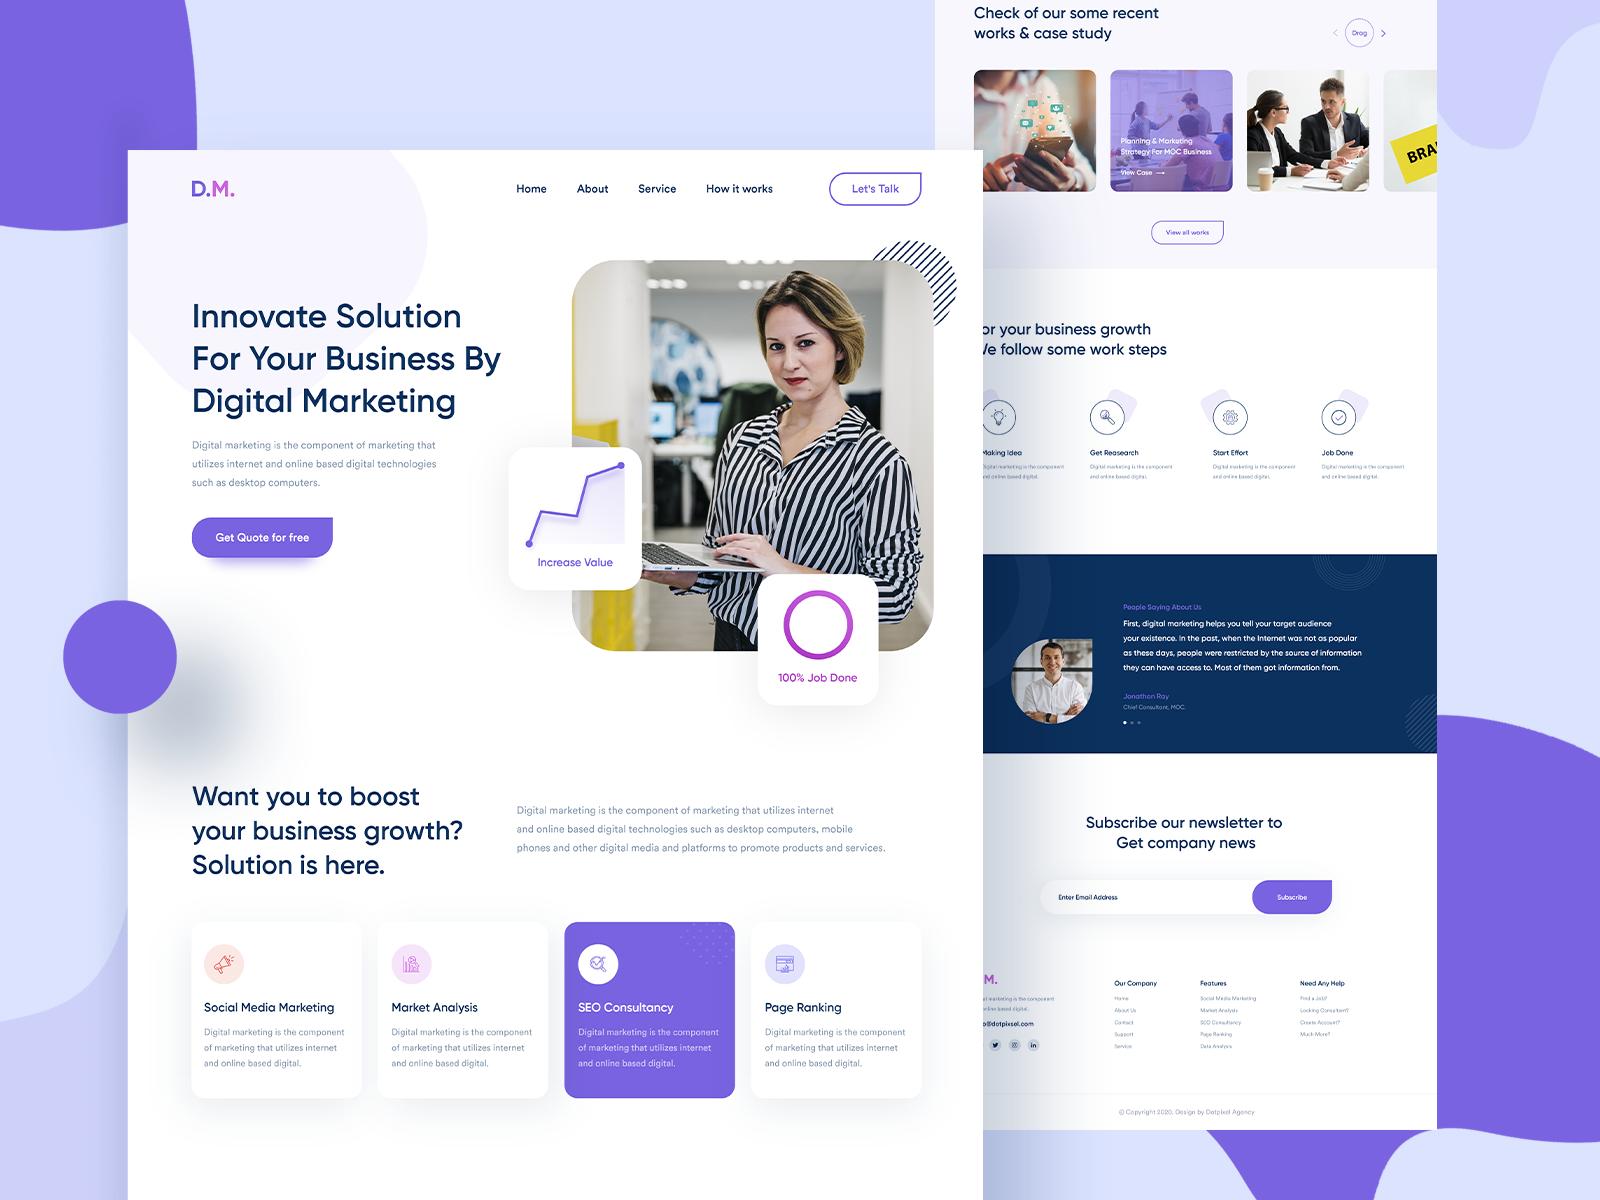 Digital Marketing Website Design In 2020 Digital Marketing Design Agency Website Design Professional Website Design